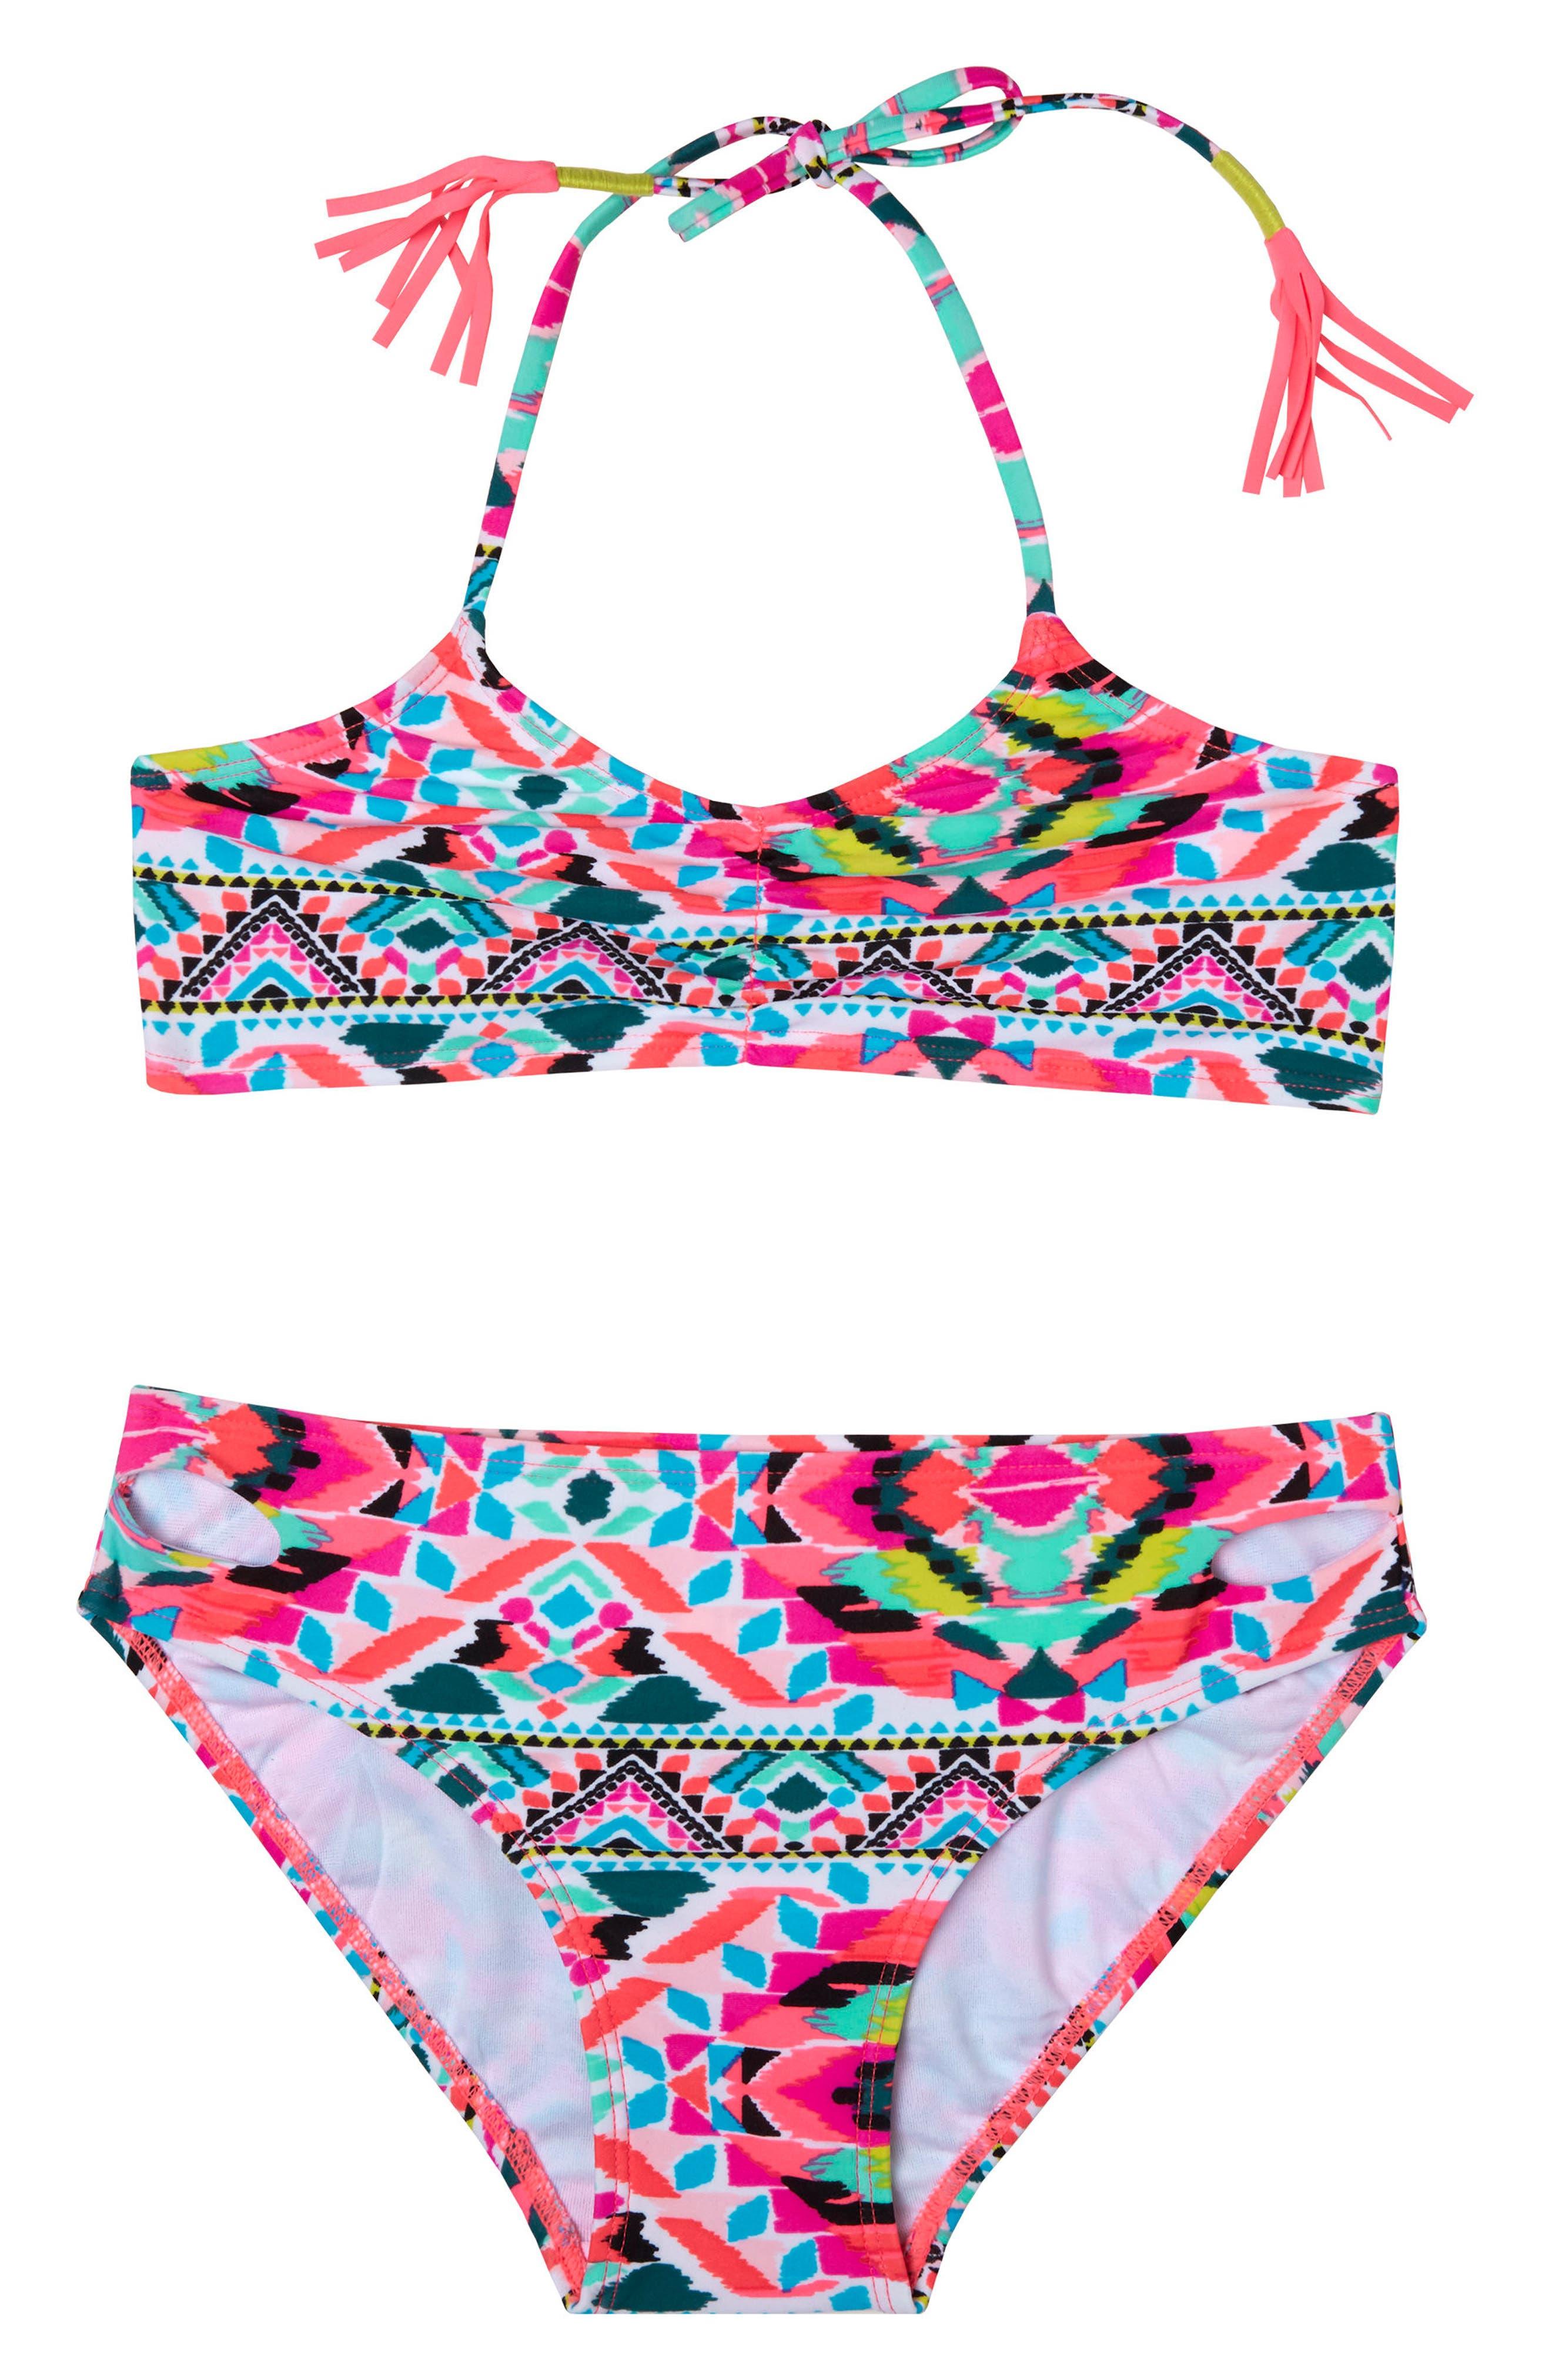 Surfside Solstice Two-Piece Swimsuit,                             Main thumbnail 1, color,                             658